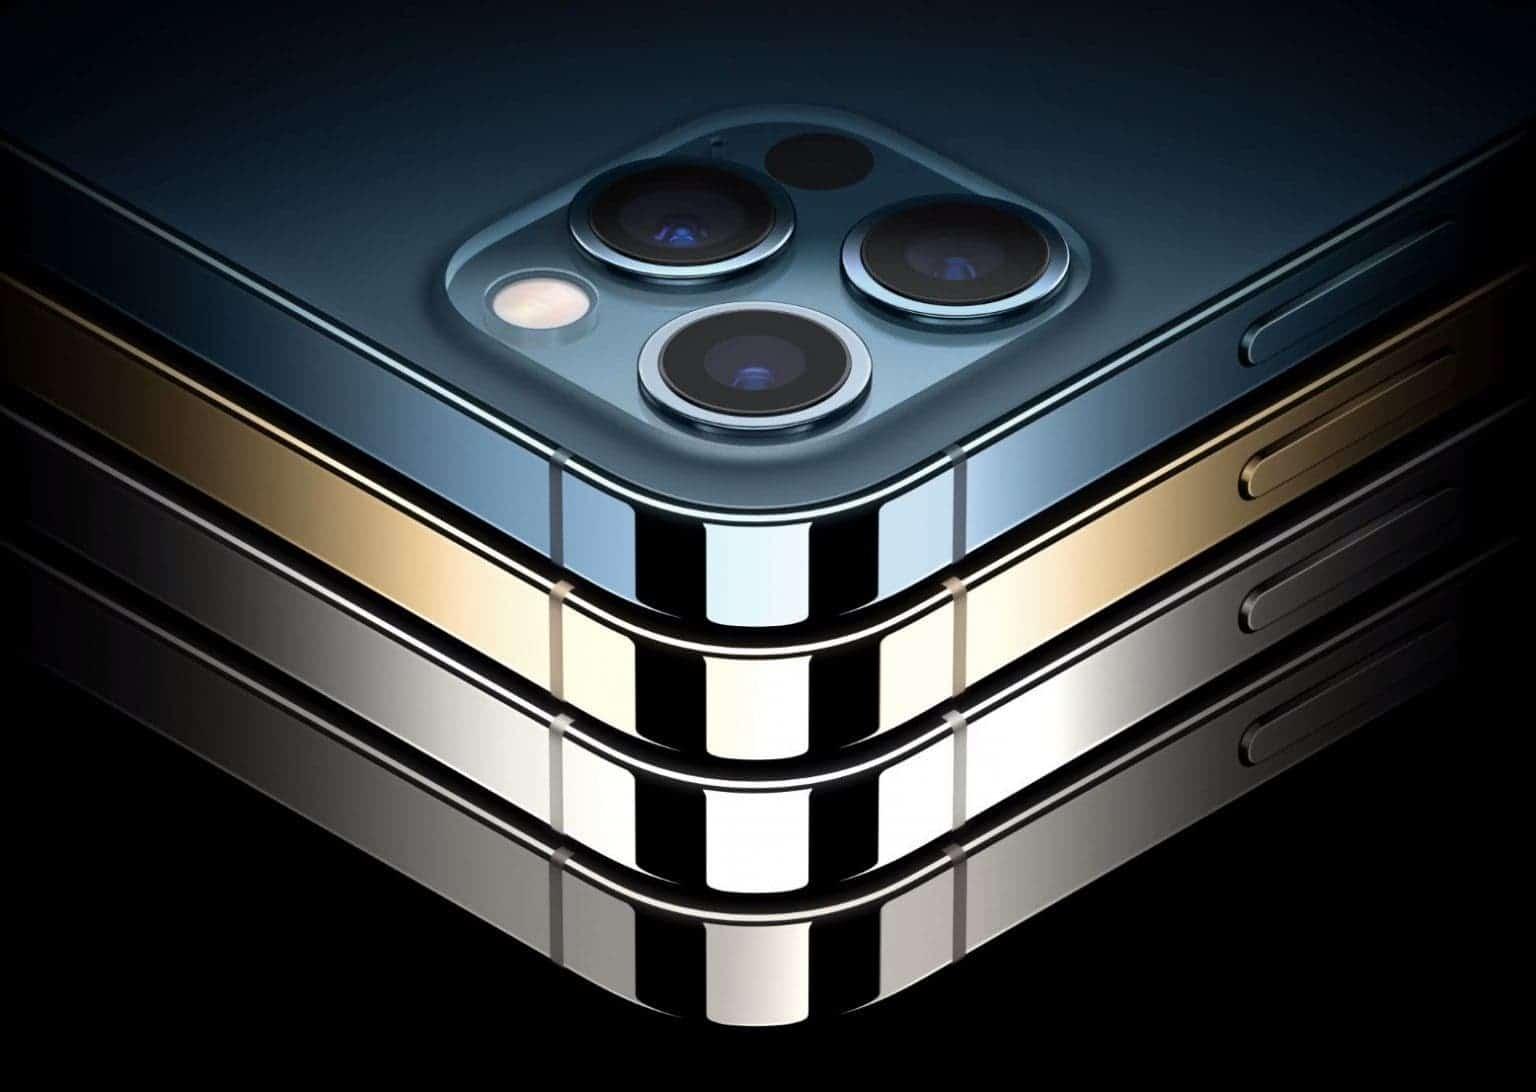 <a href='/iphone-12/'>iPhone 12</a> Serisi, <a href='/batarya/'>Batarya</a> Gücü Konusunda Sınıfta Kaldı